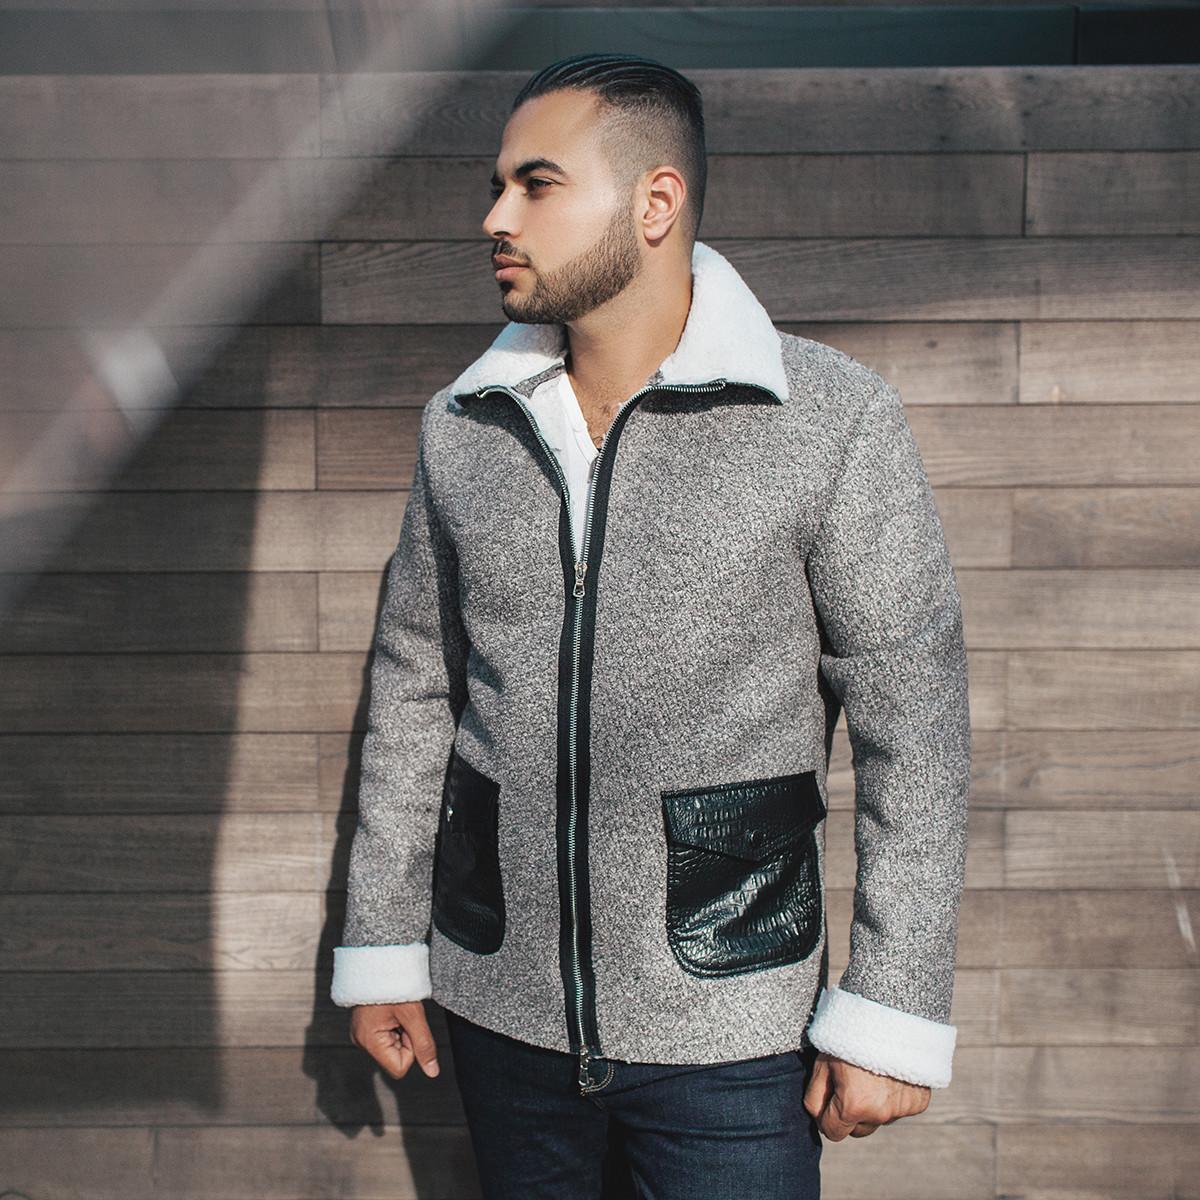 e78cb406722 Стильная мужская куртка